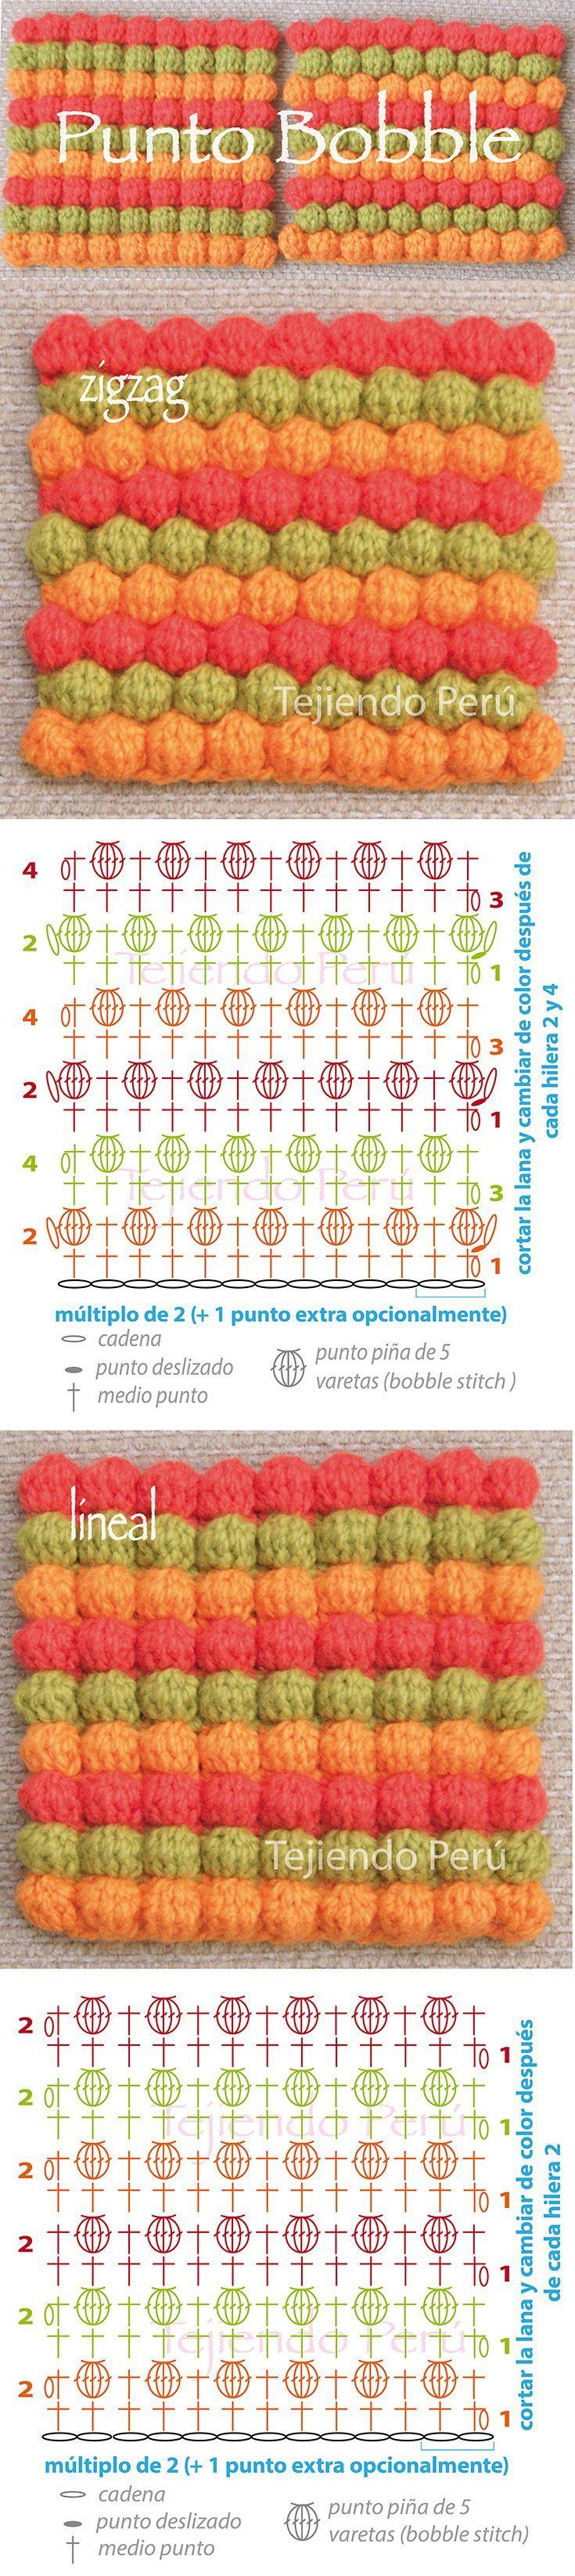 Mantita Chevron Pinterest Crochet Stitches And Stitch Pattern Diagram Mantas